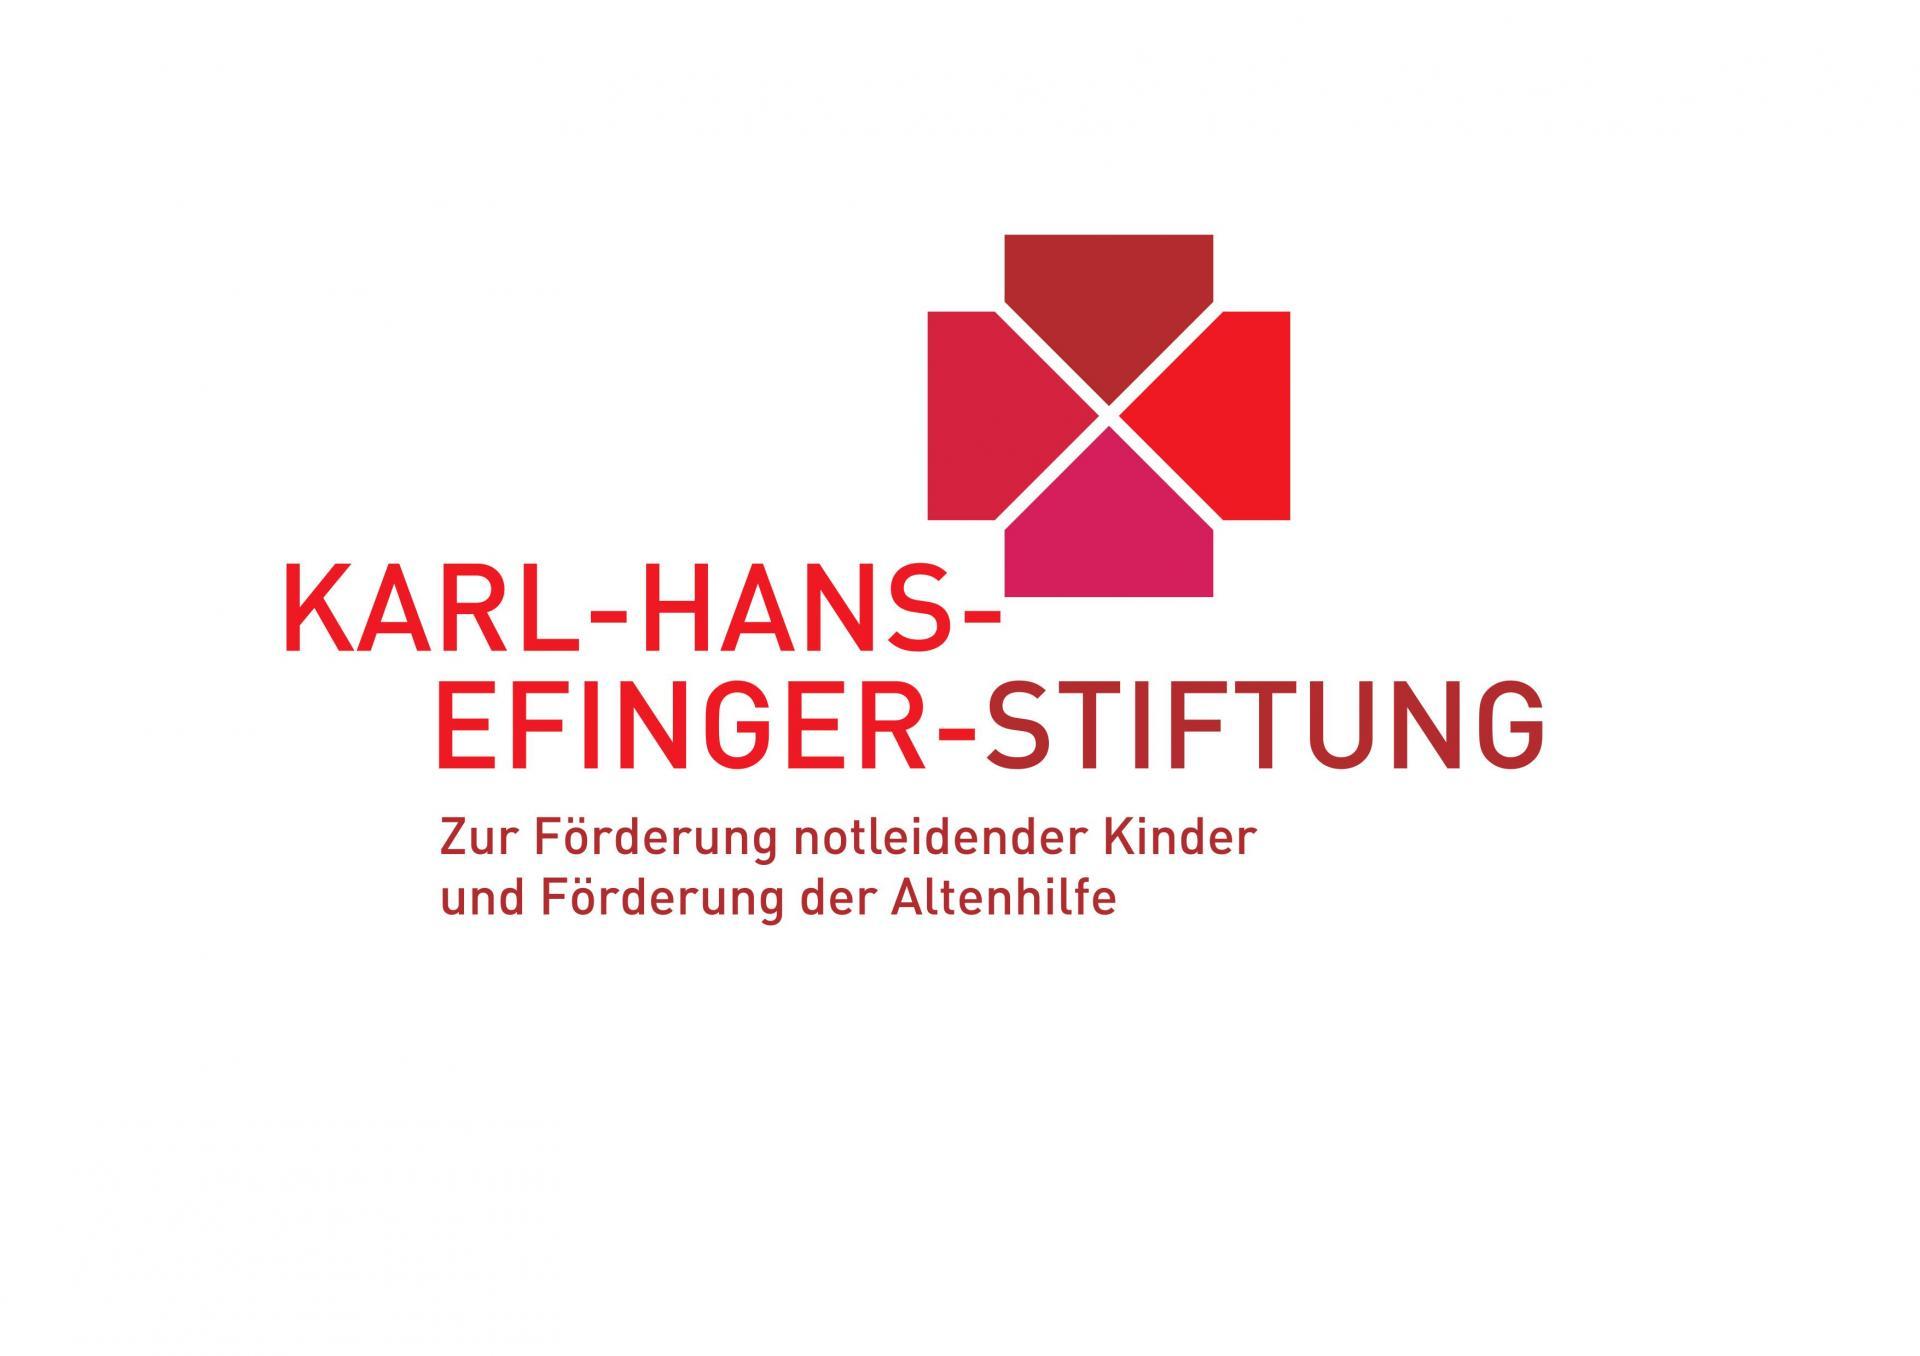 Karl-Hans-Efinger-Stiftung